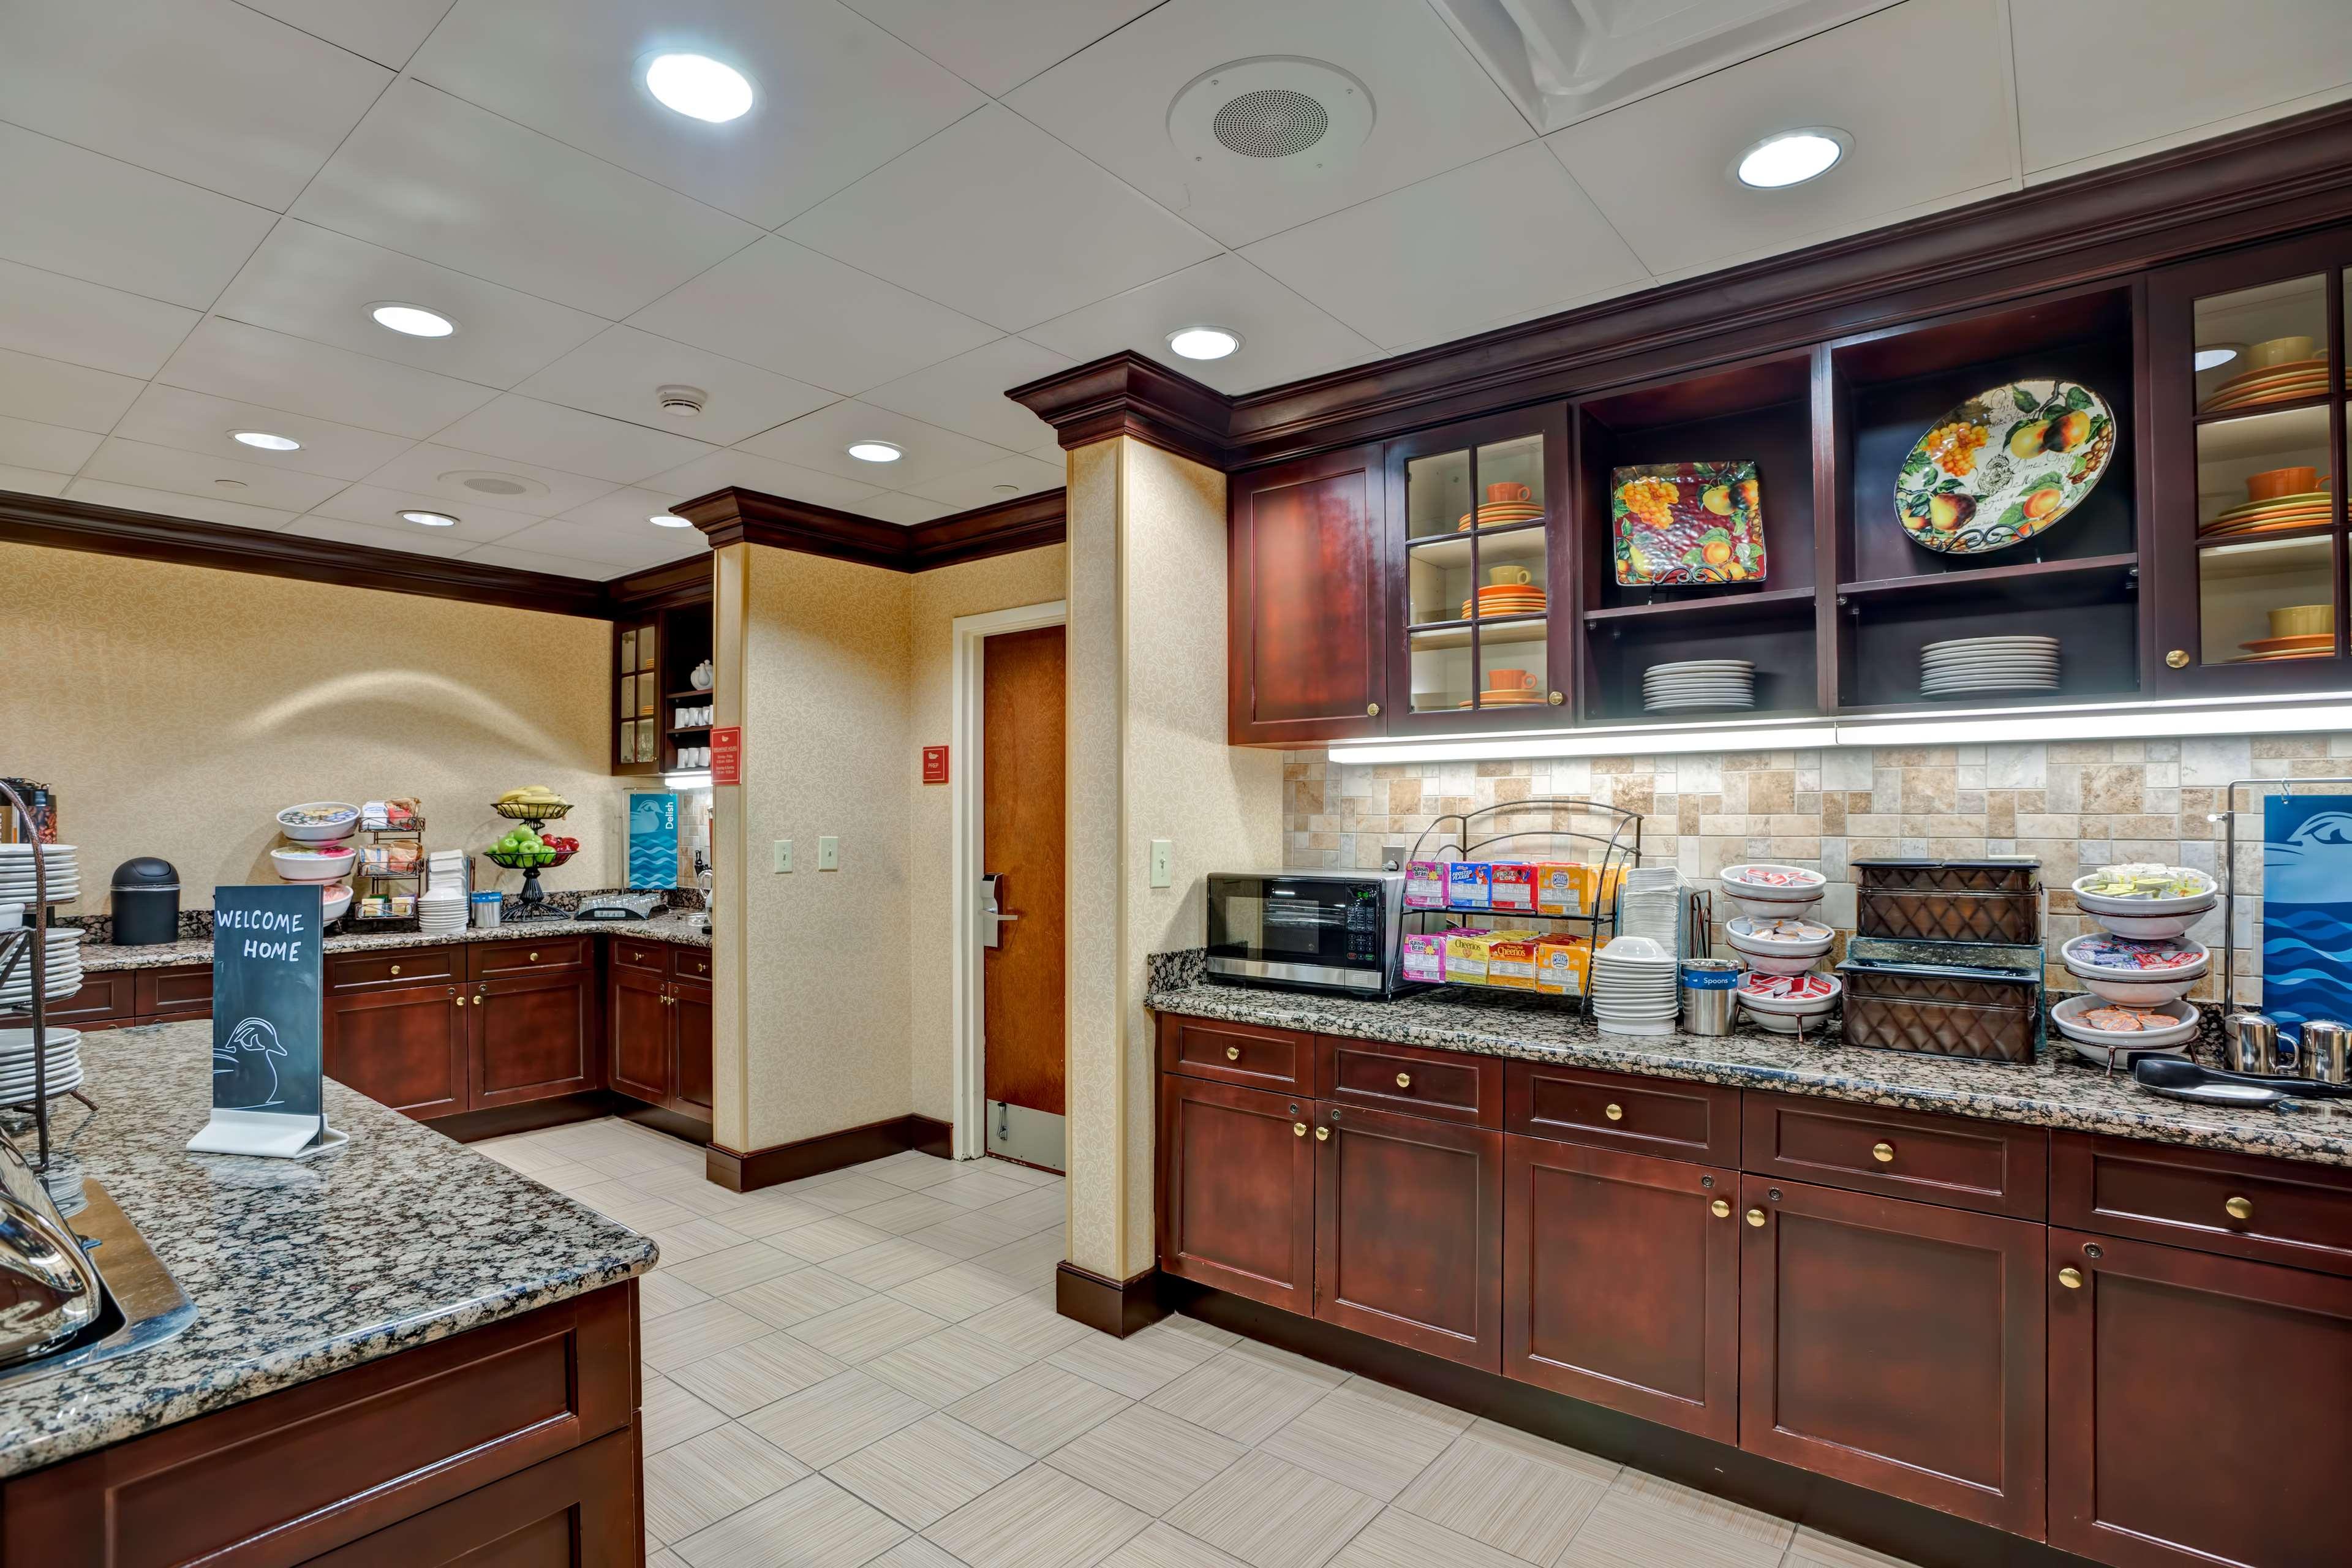 Homewood Suites by Hilton Fredericksburg image 8